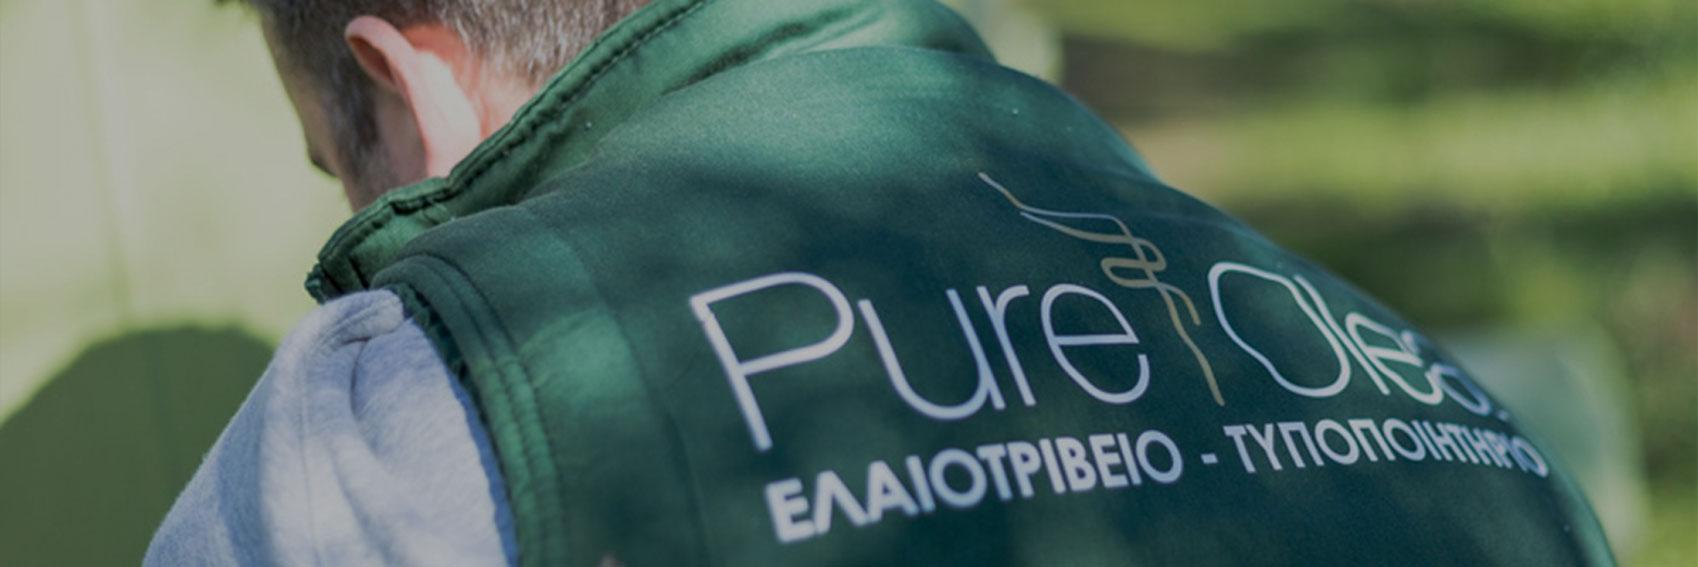 Pureolea Eshop bg laptop